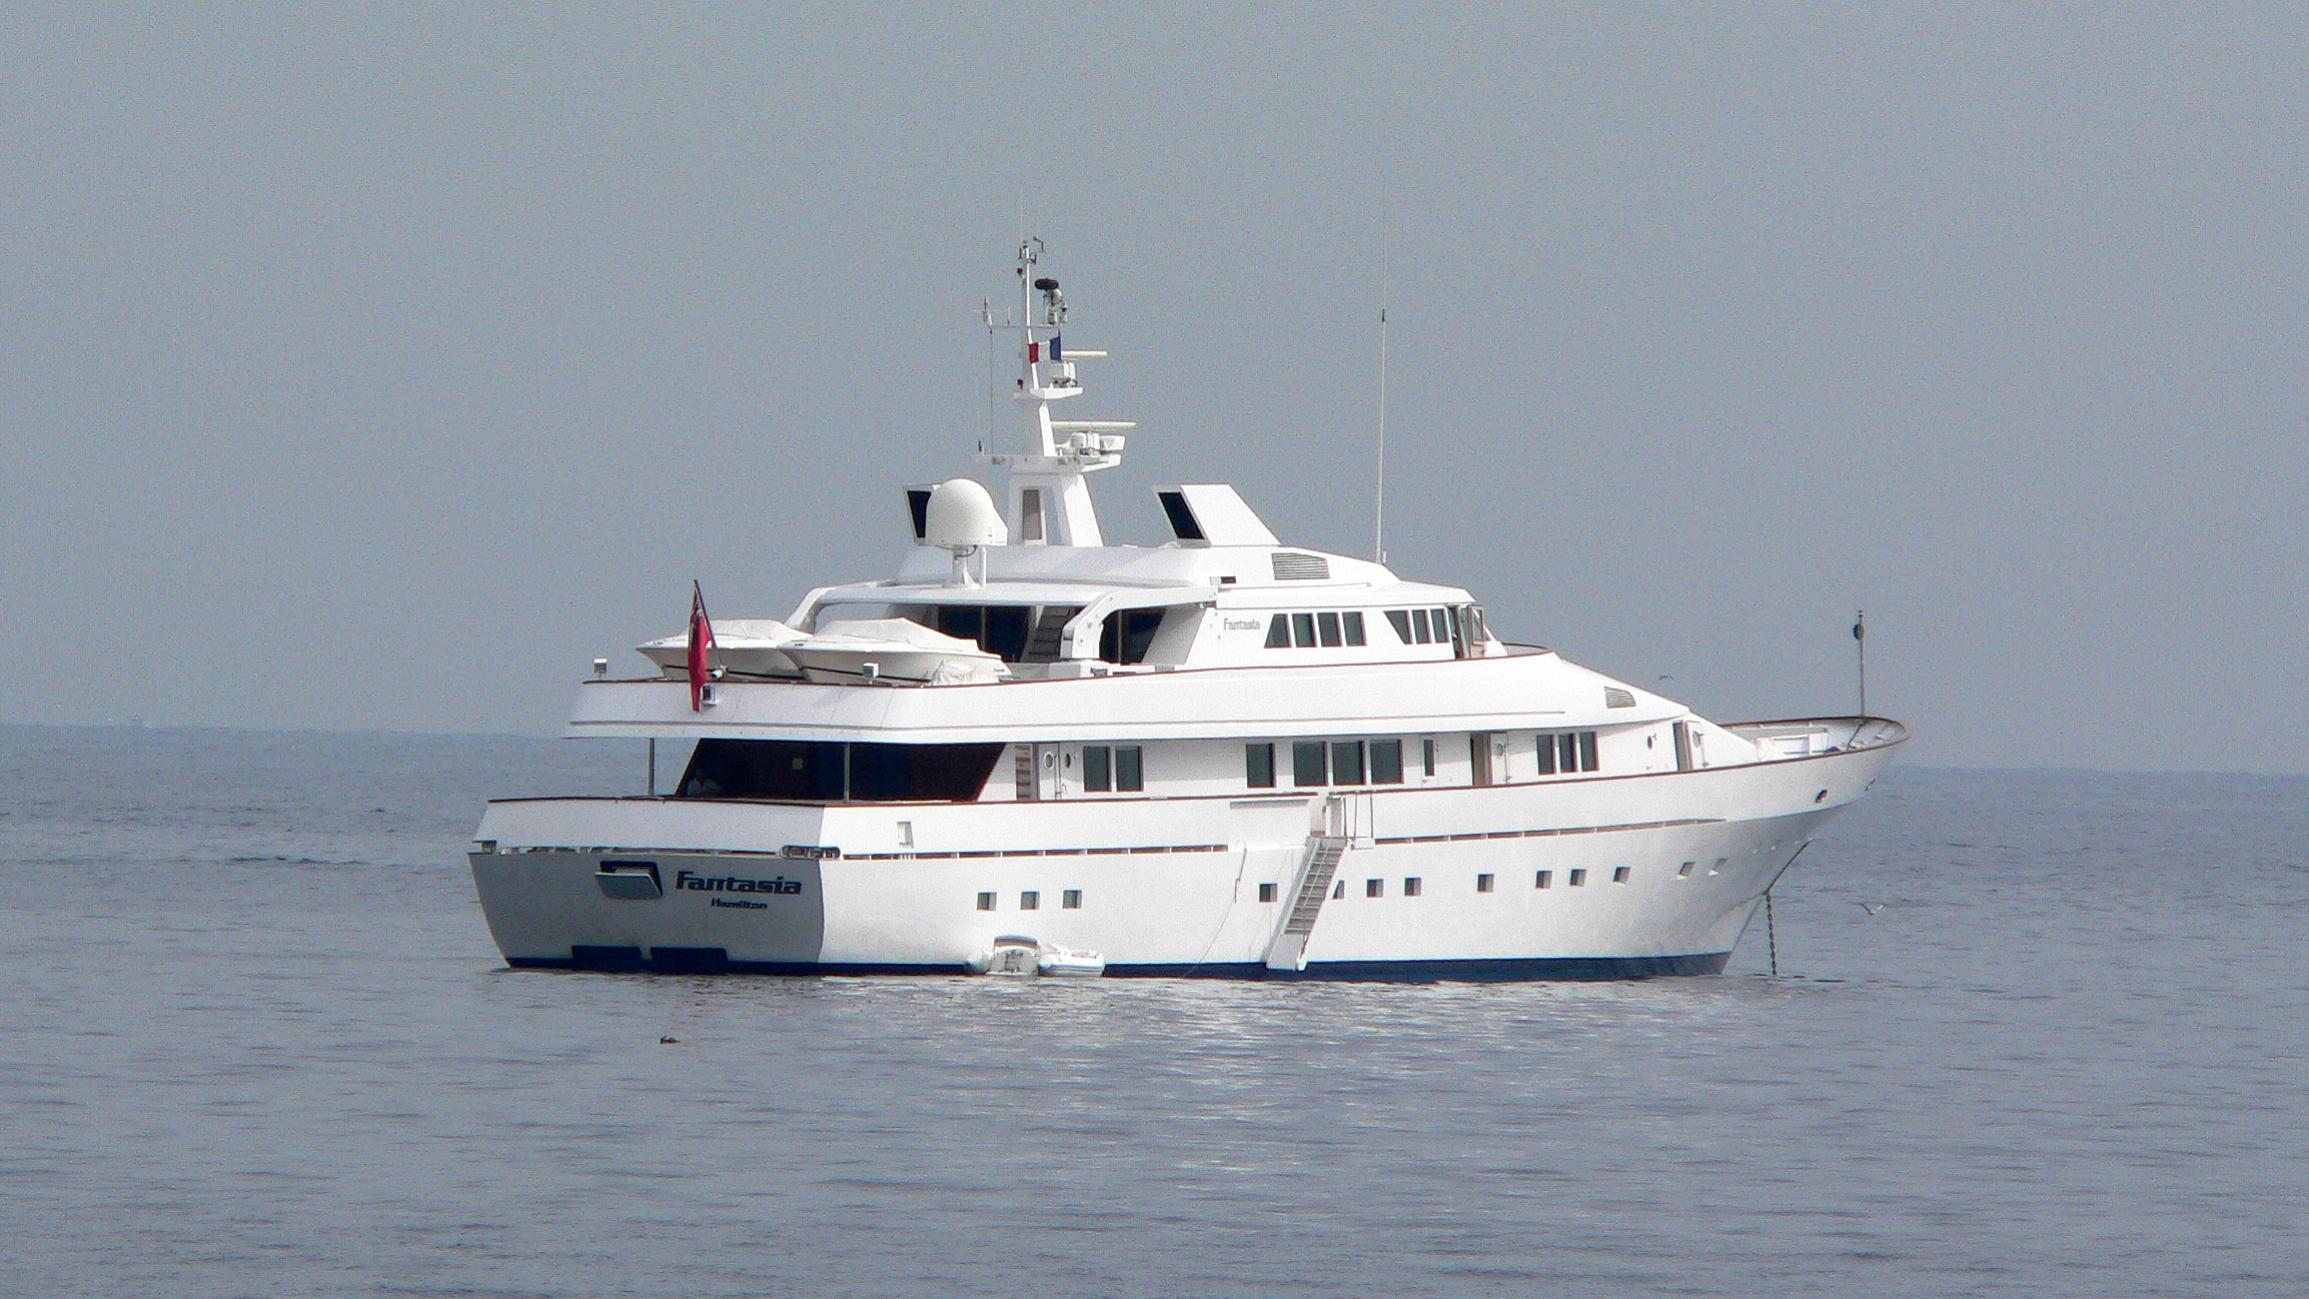 fantasia-motor-yacht-codecasa-1986-50m-stern